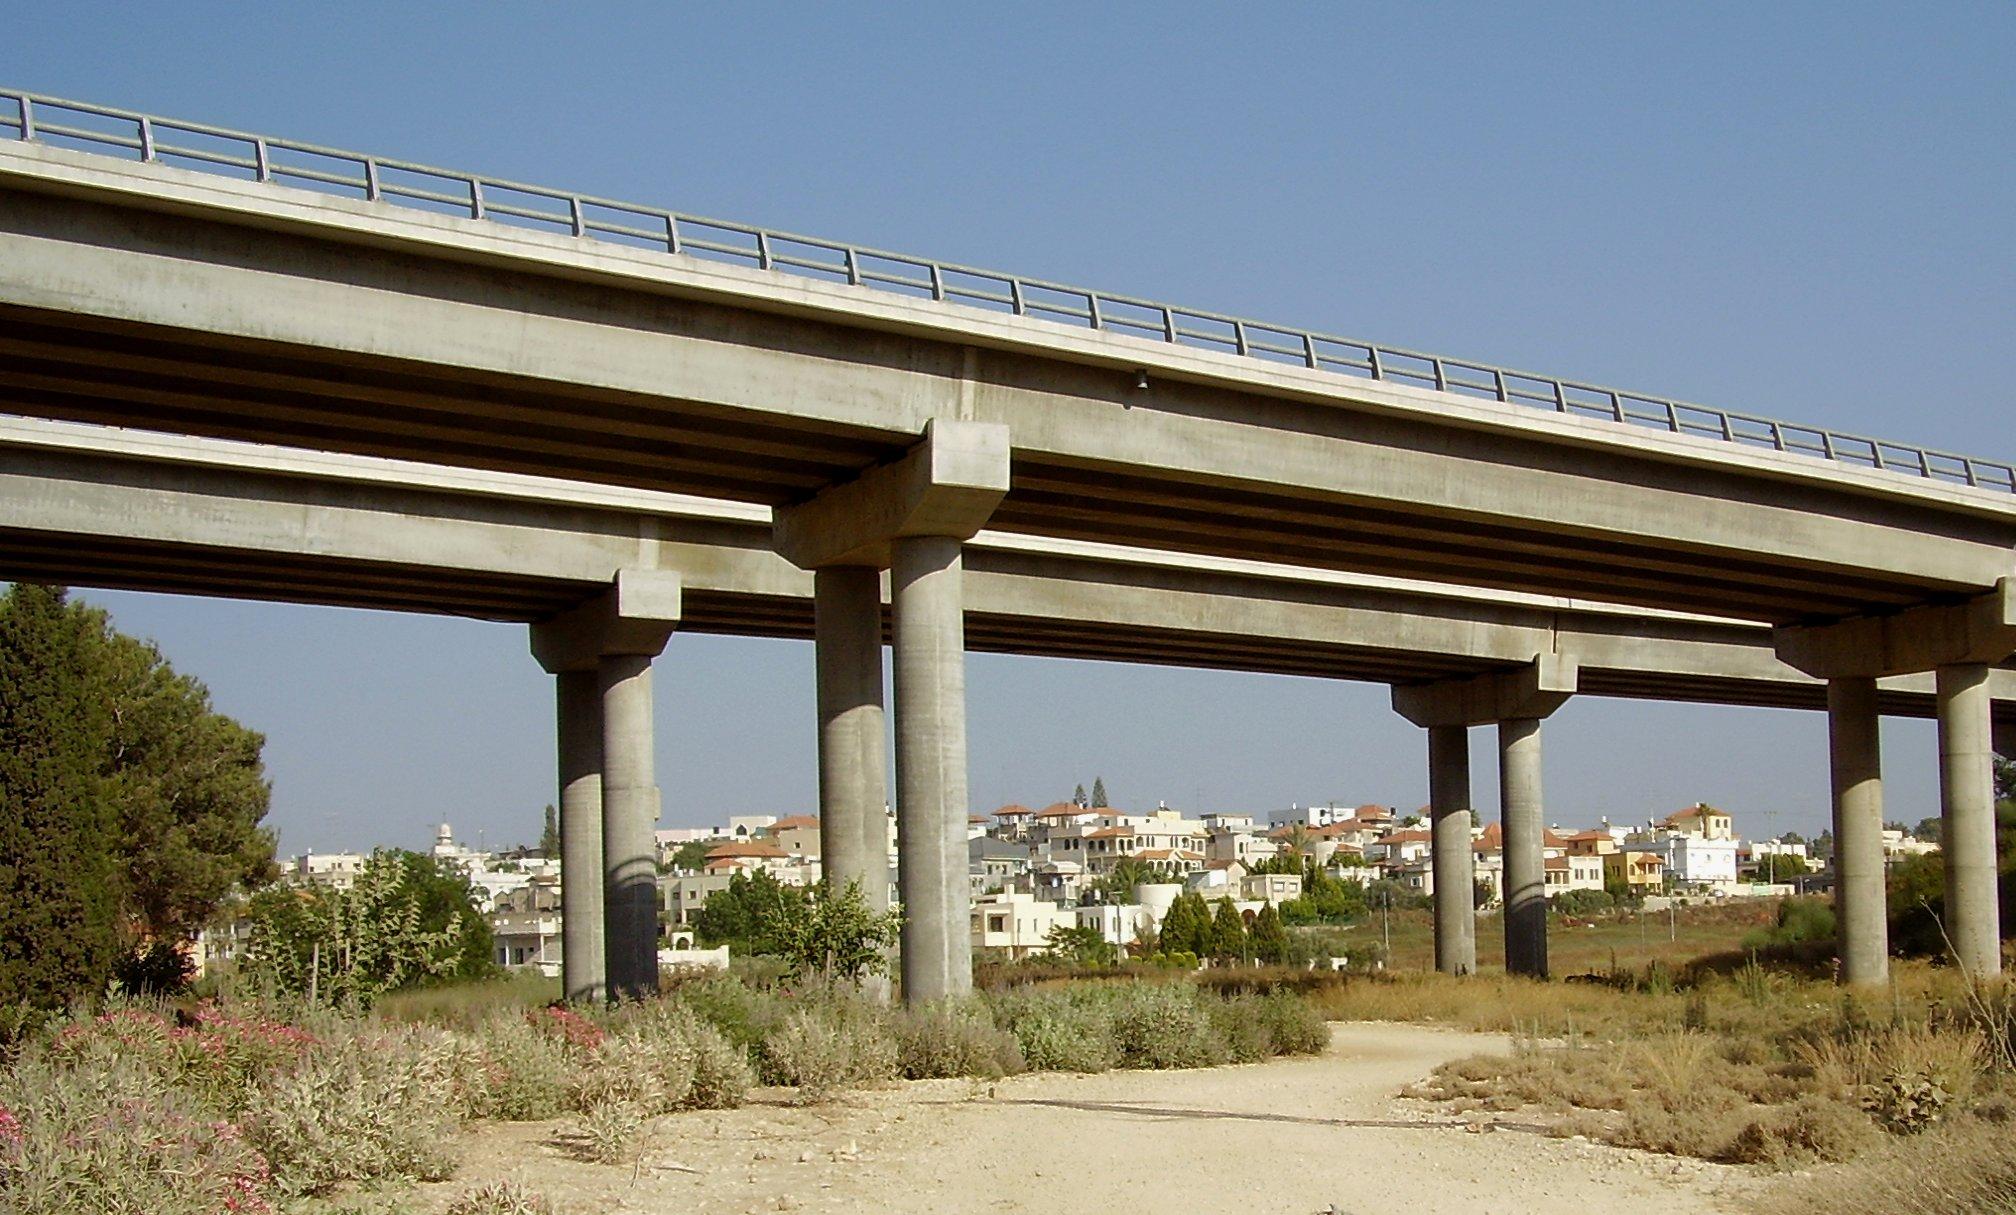 File:Highway 6 Narbeta bridge and Meiser b1.jpg - Wikimedia Commons